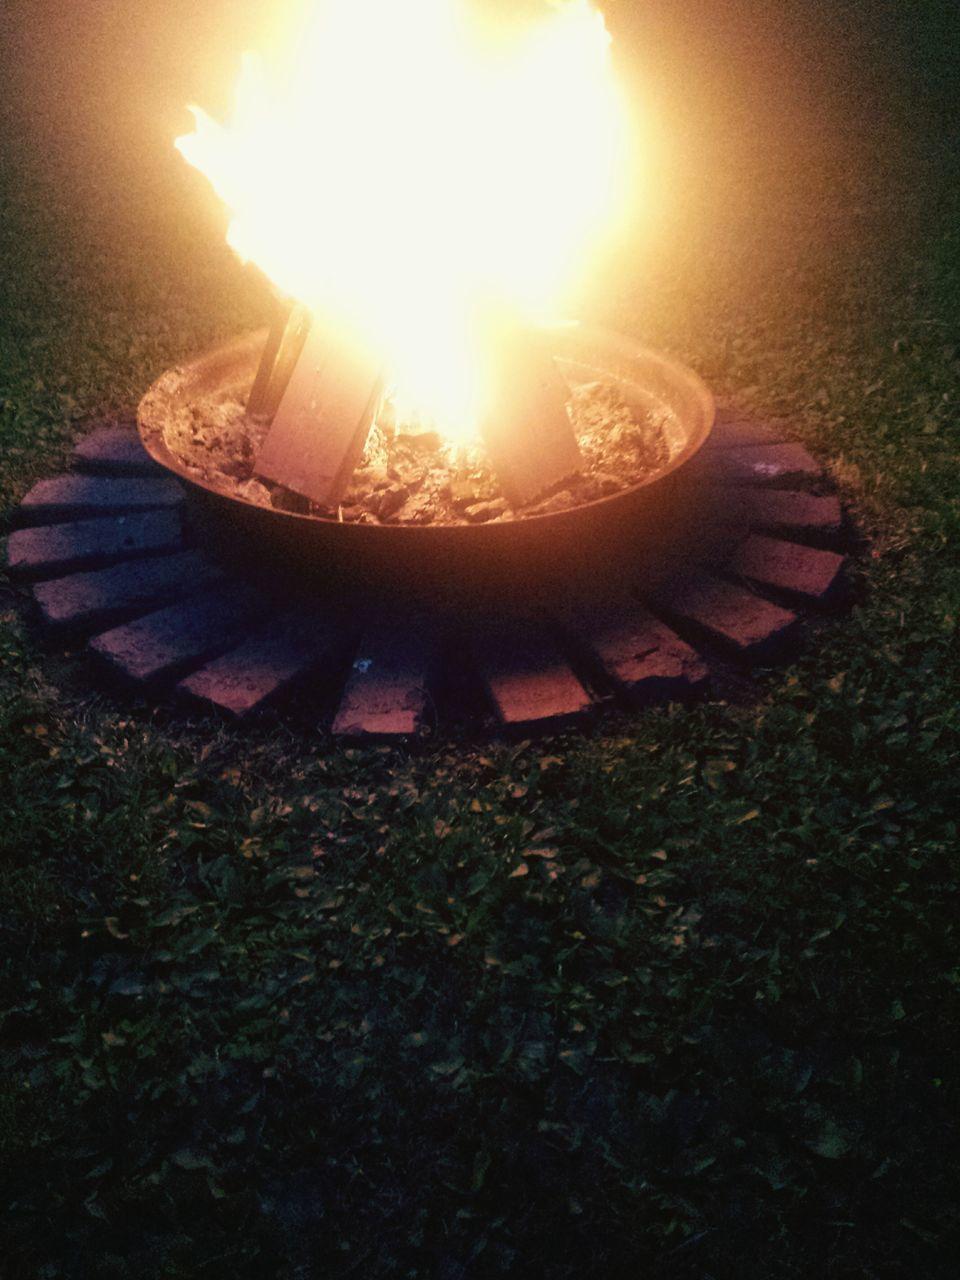 flame, burning, heat - temperature, glowing, fire pit, outdoors, night, no people, bonfire, grass, diya - oil lamp, diwali, close-up